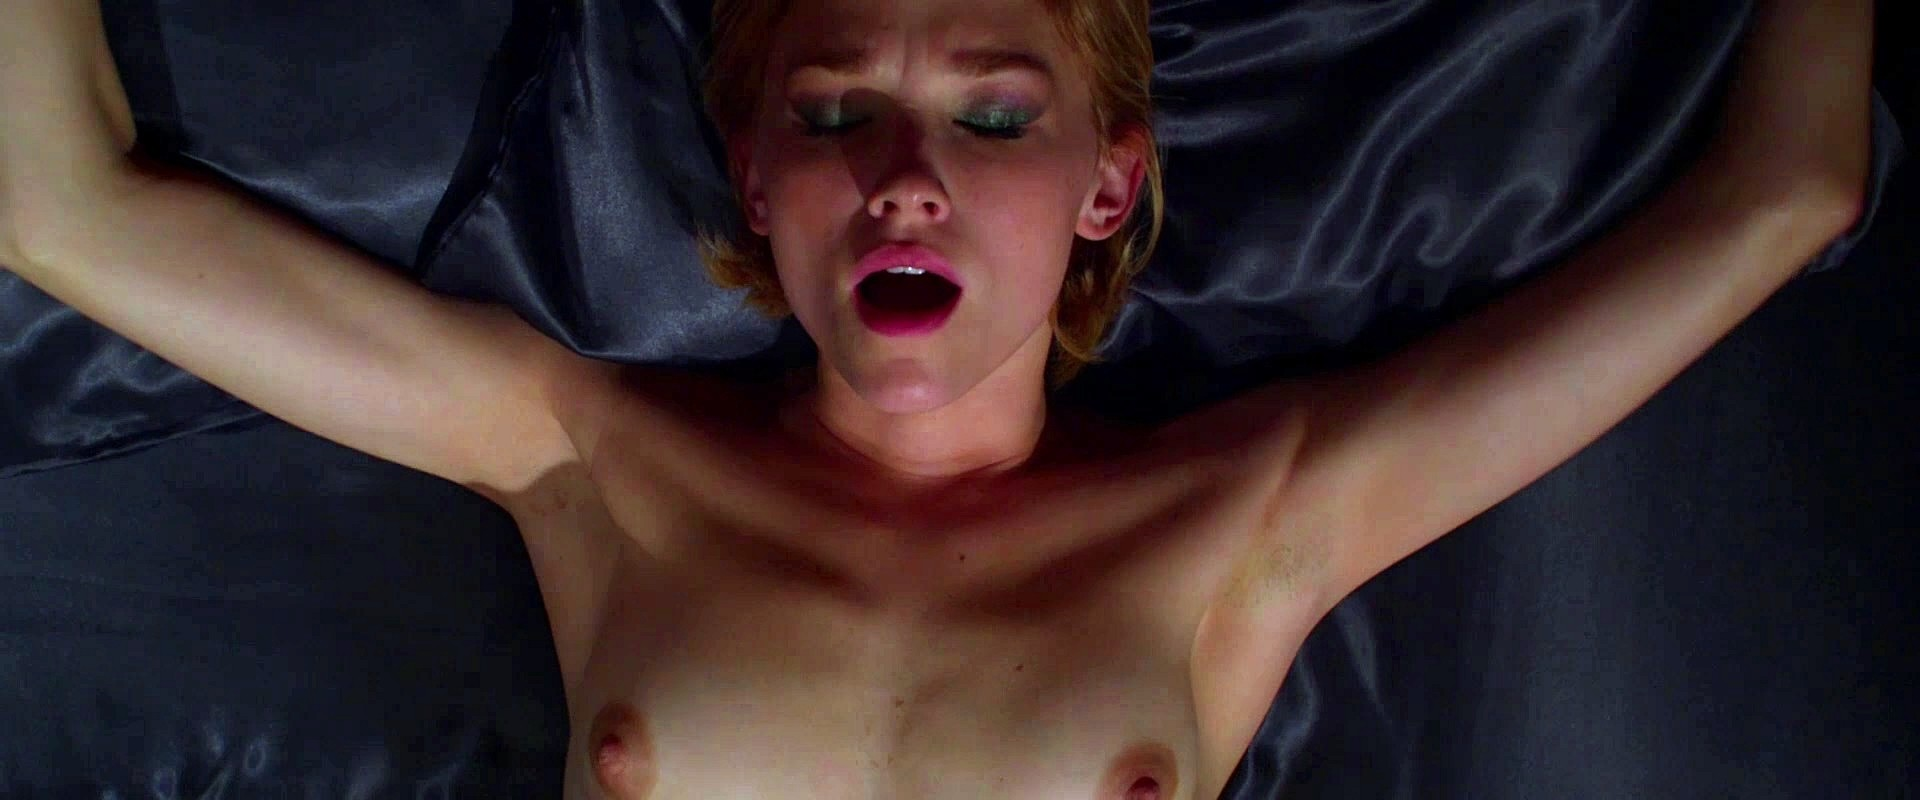 Idea Stana katic orgasm has left